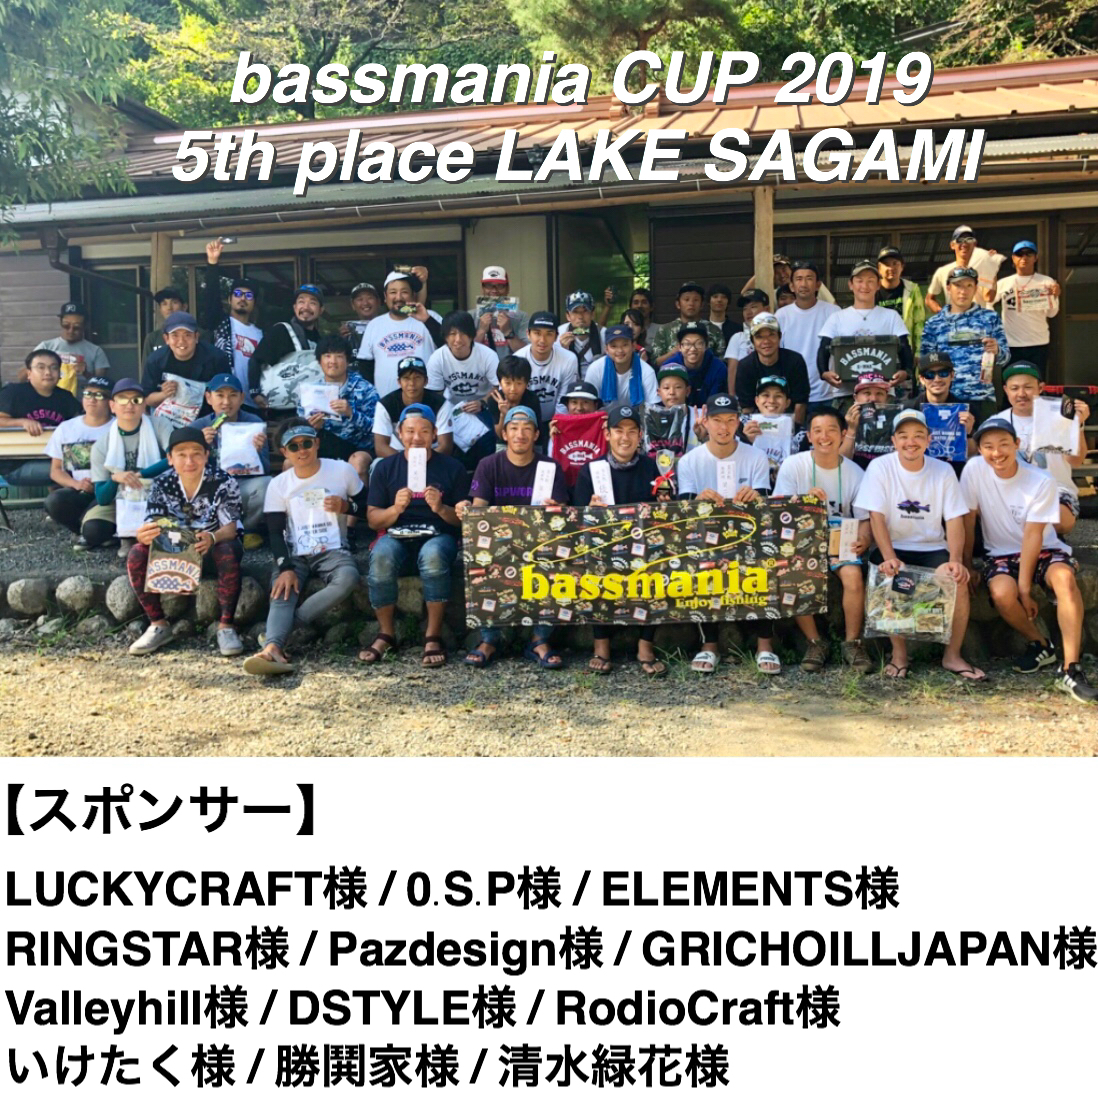 bassmania CUP 第5戦  9月15日 相模湖  【大会結果&レポート】